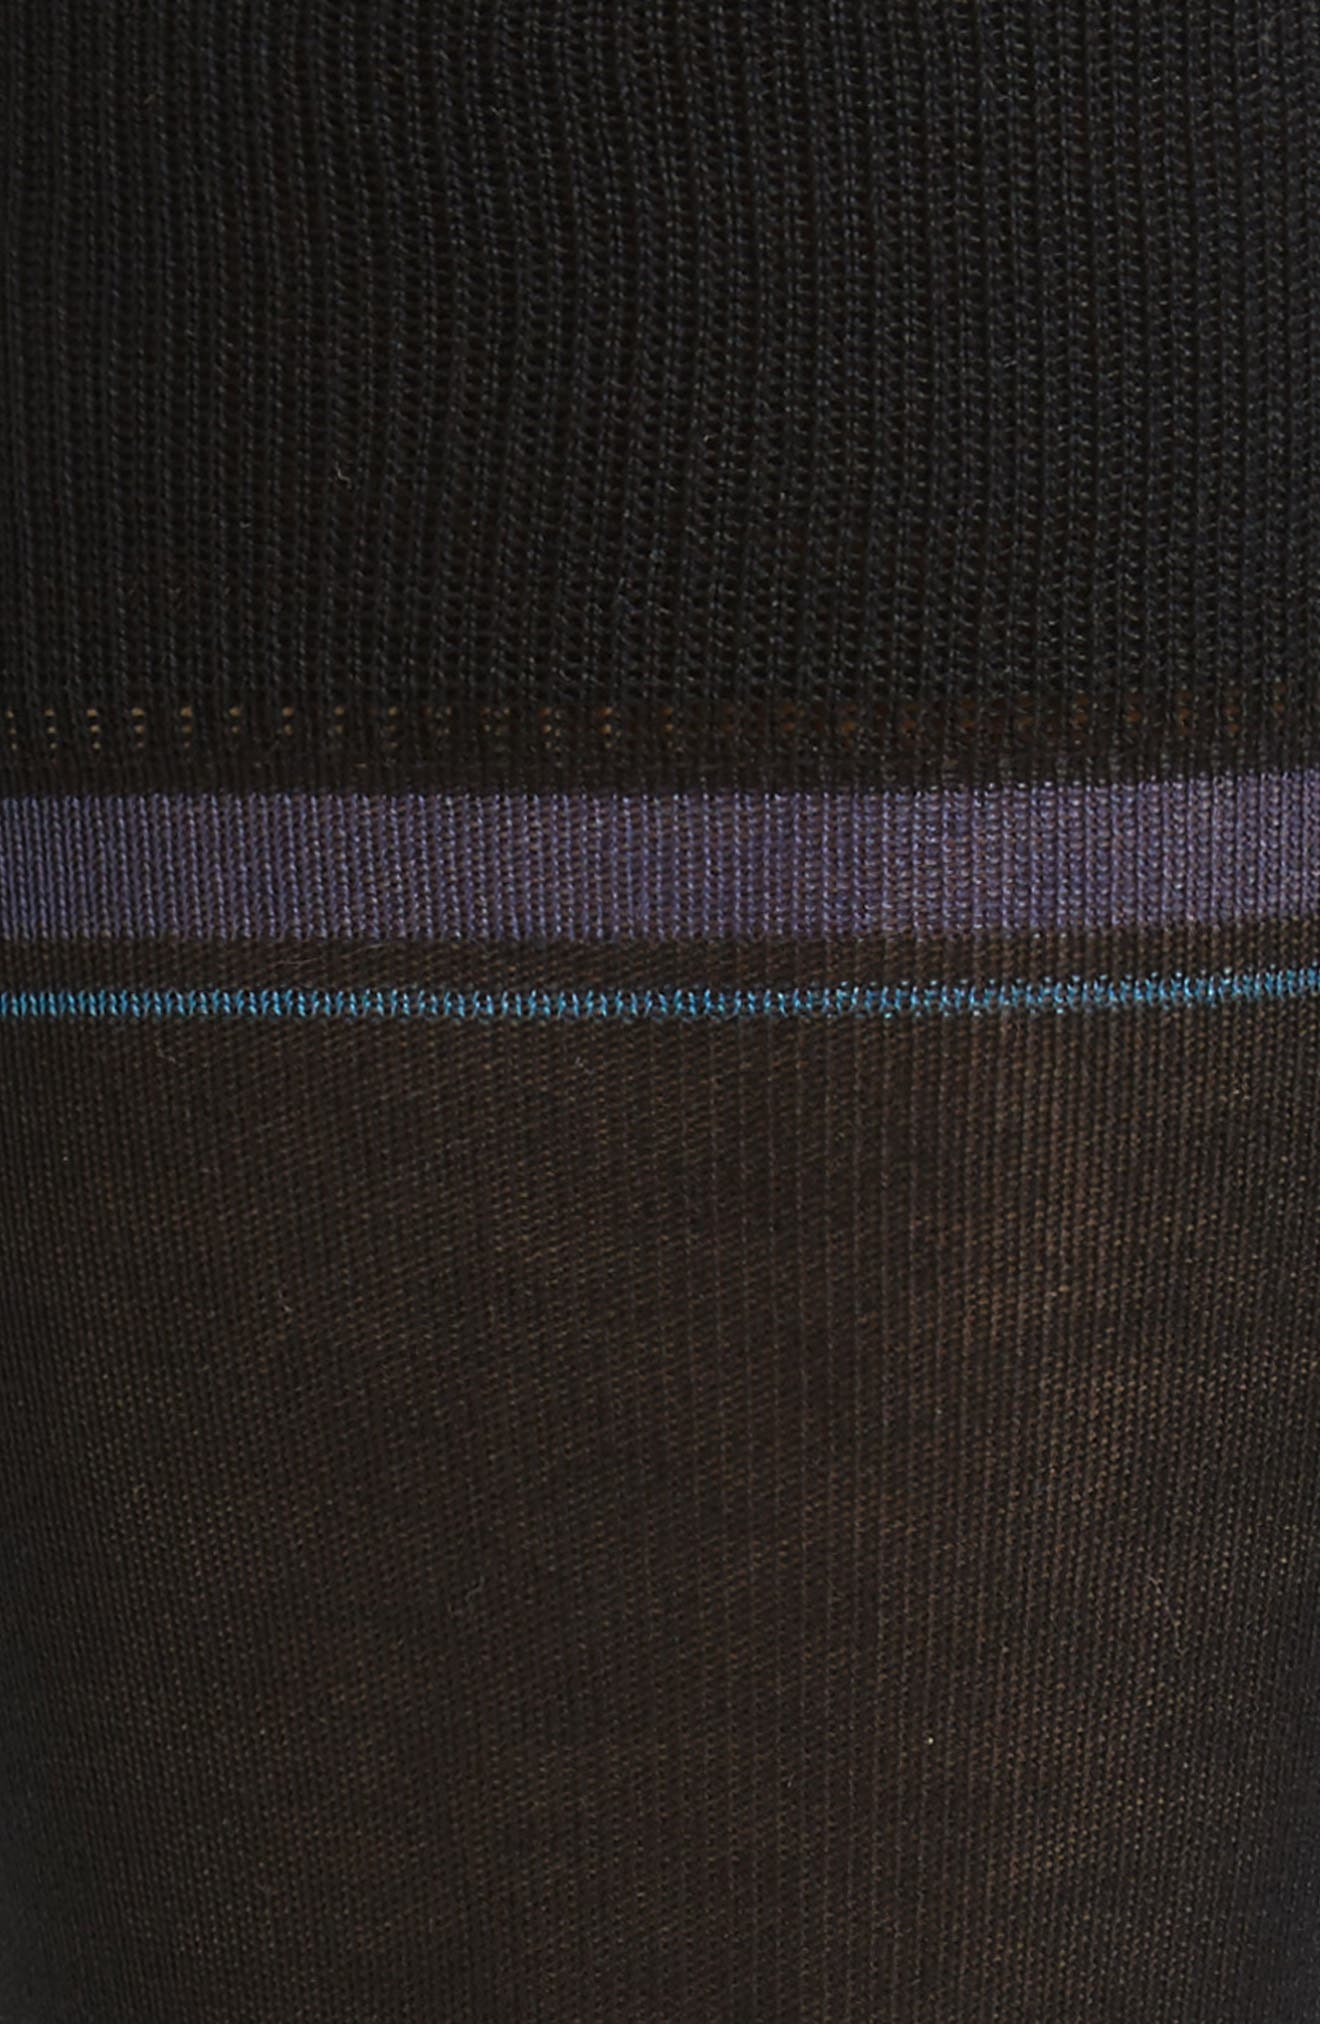 Double Banded Socks,                             Alternate thumbnail 2, color,                             Black/ Blue